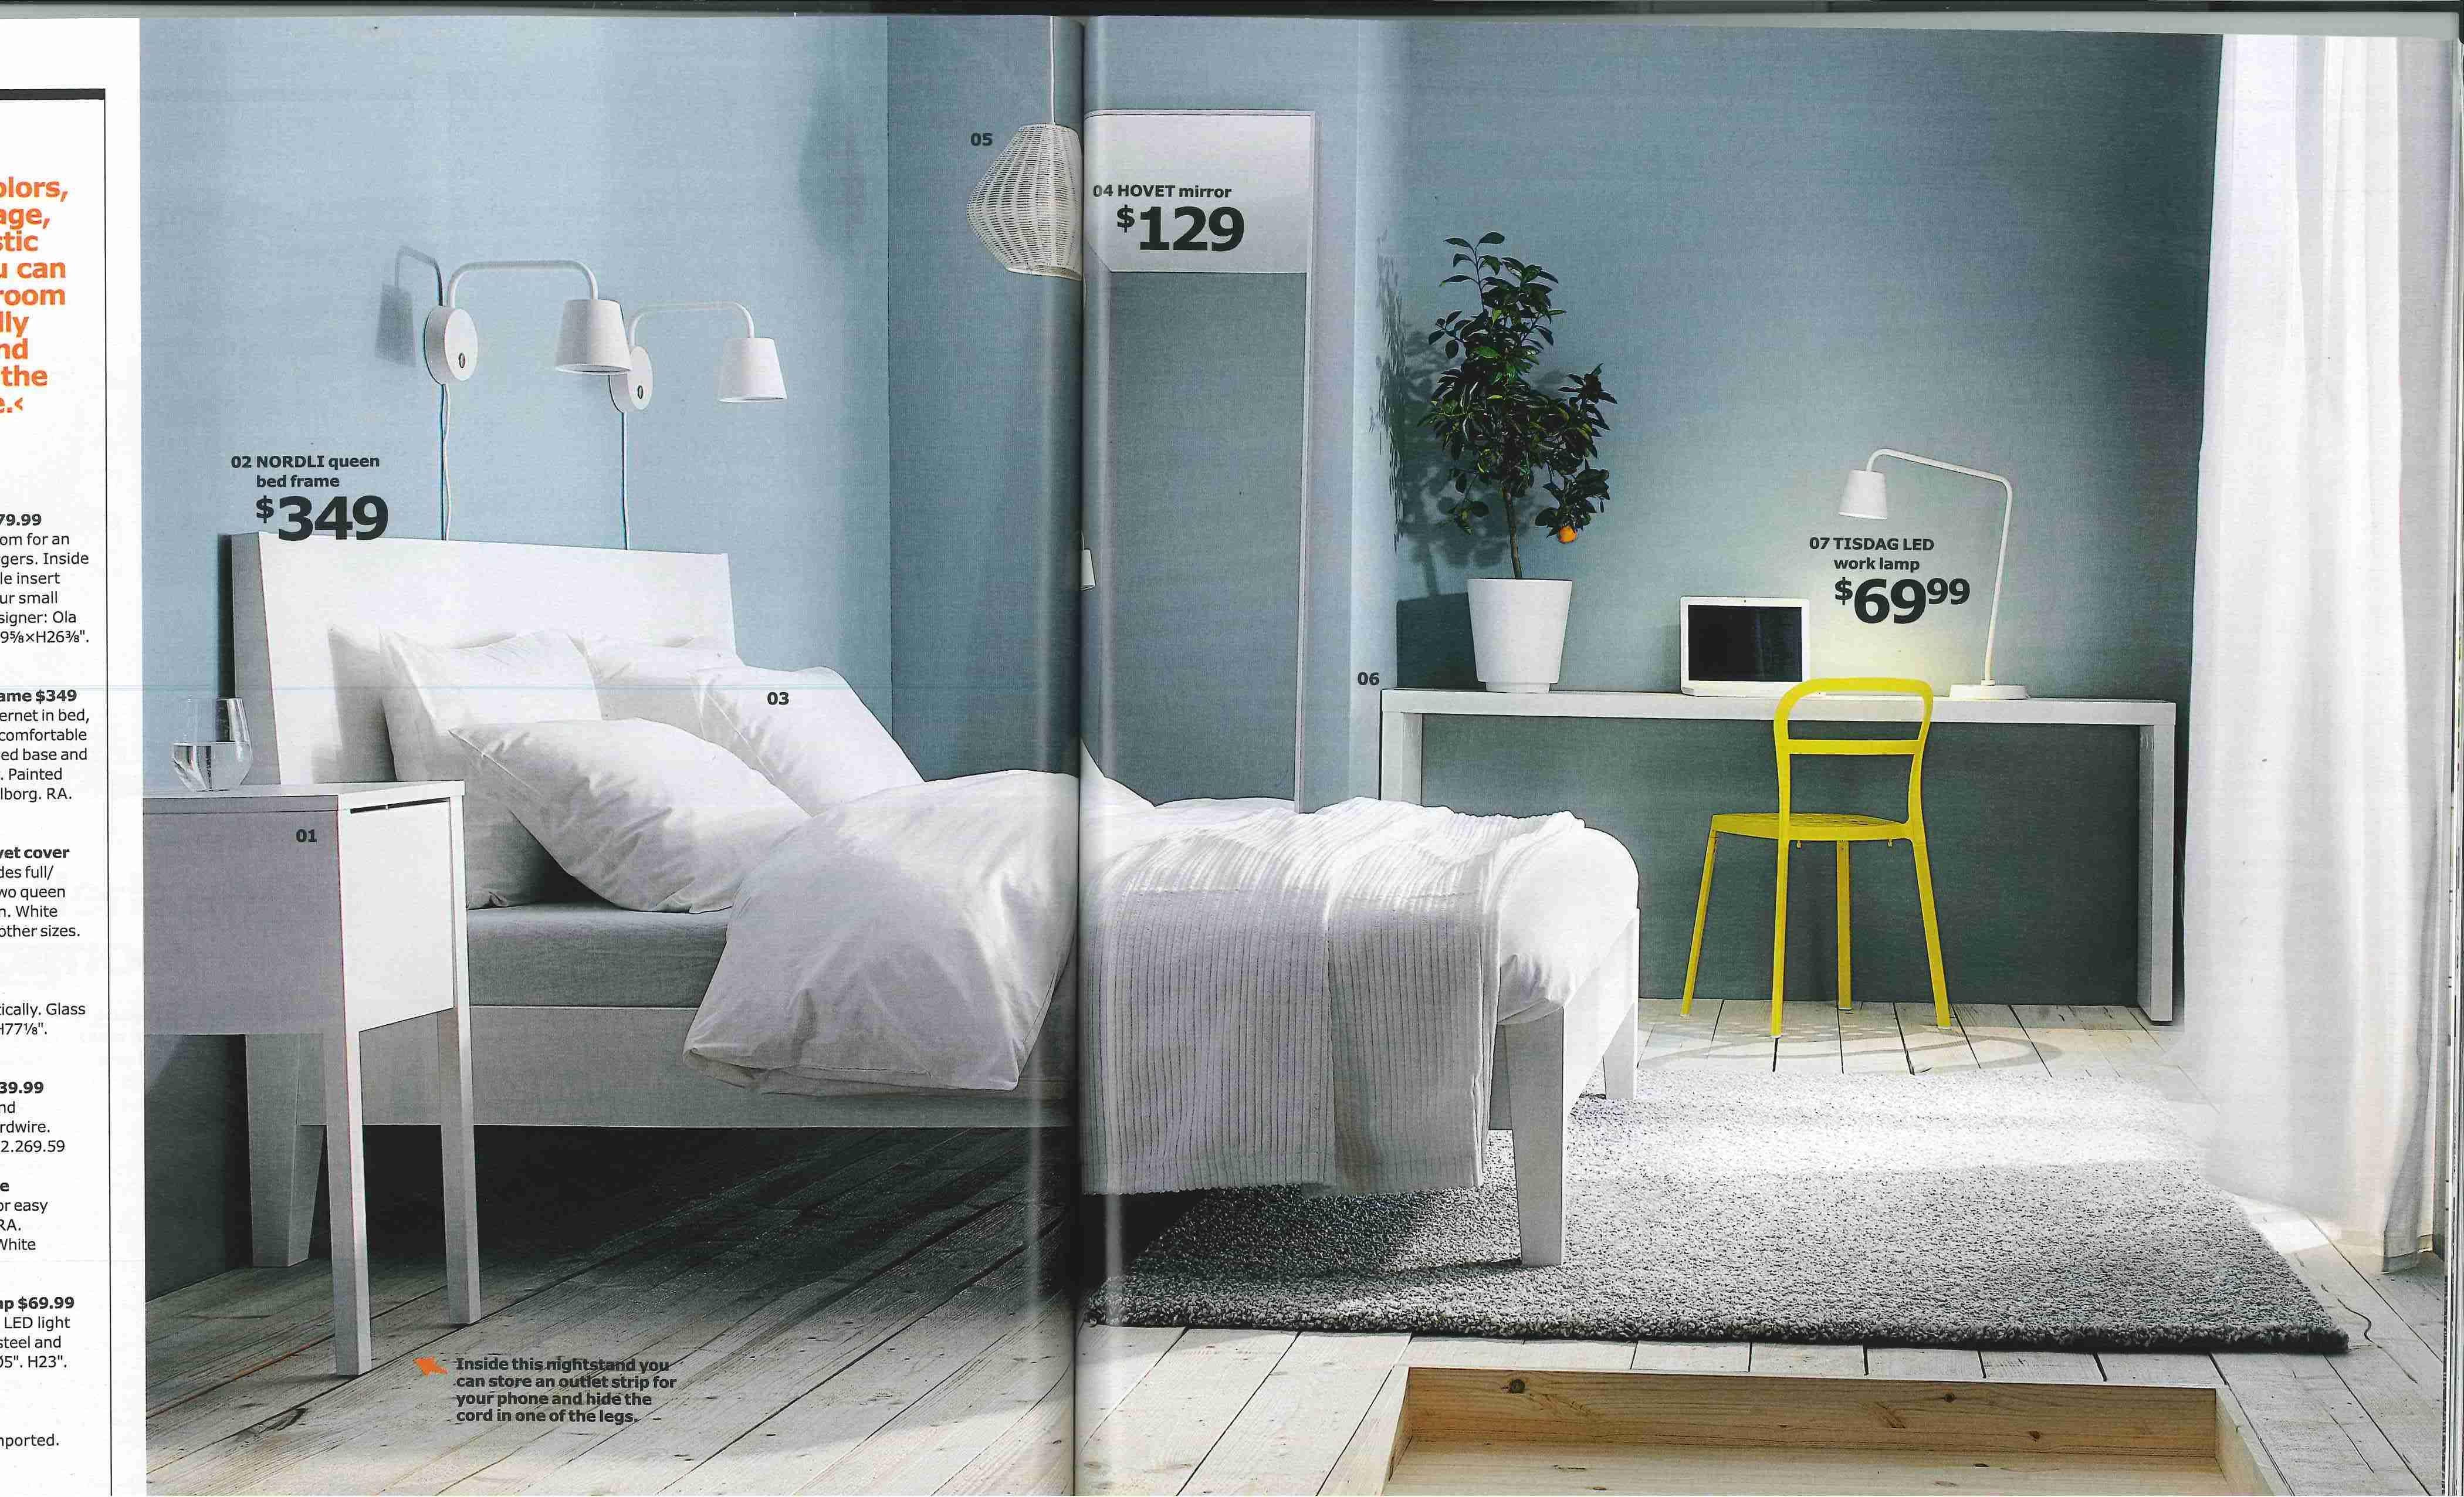 0d372de87eaca9ebadd769c6ce393ccd Impressionnant De Table Gigogne Ikea Concept